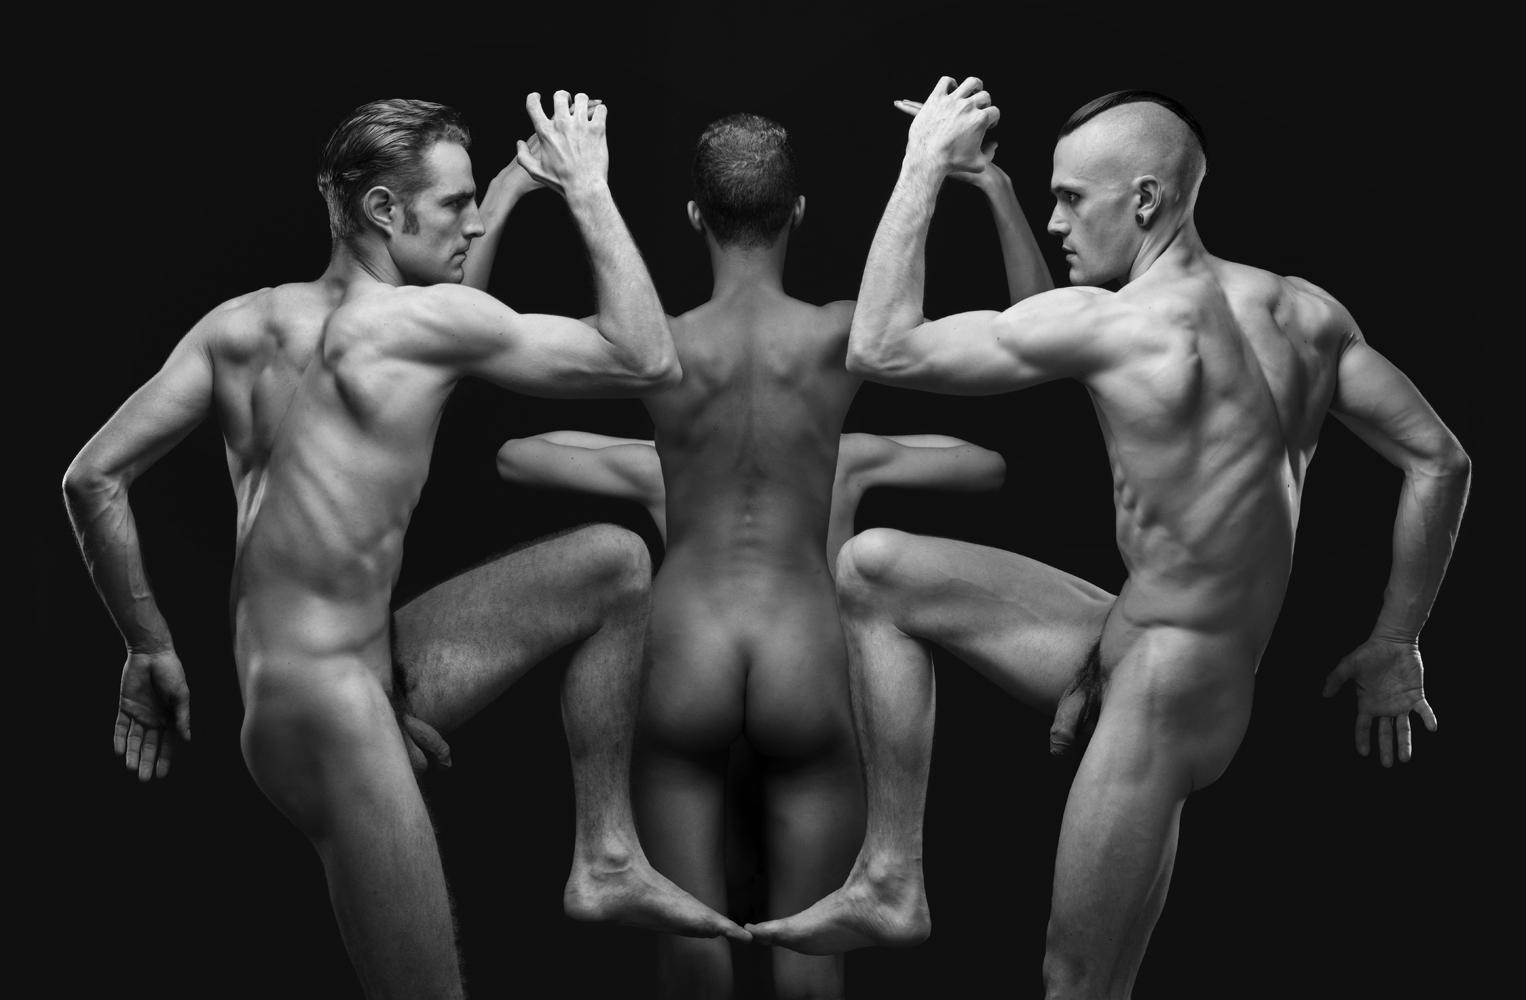 nude-photographer-olivier-valsecchi-81